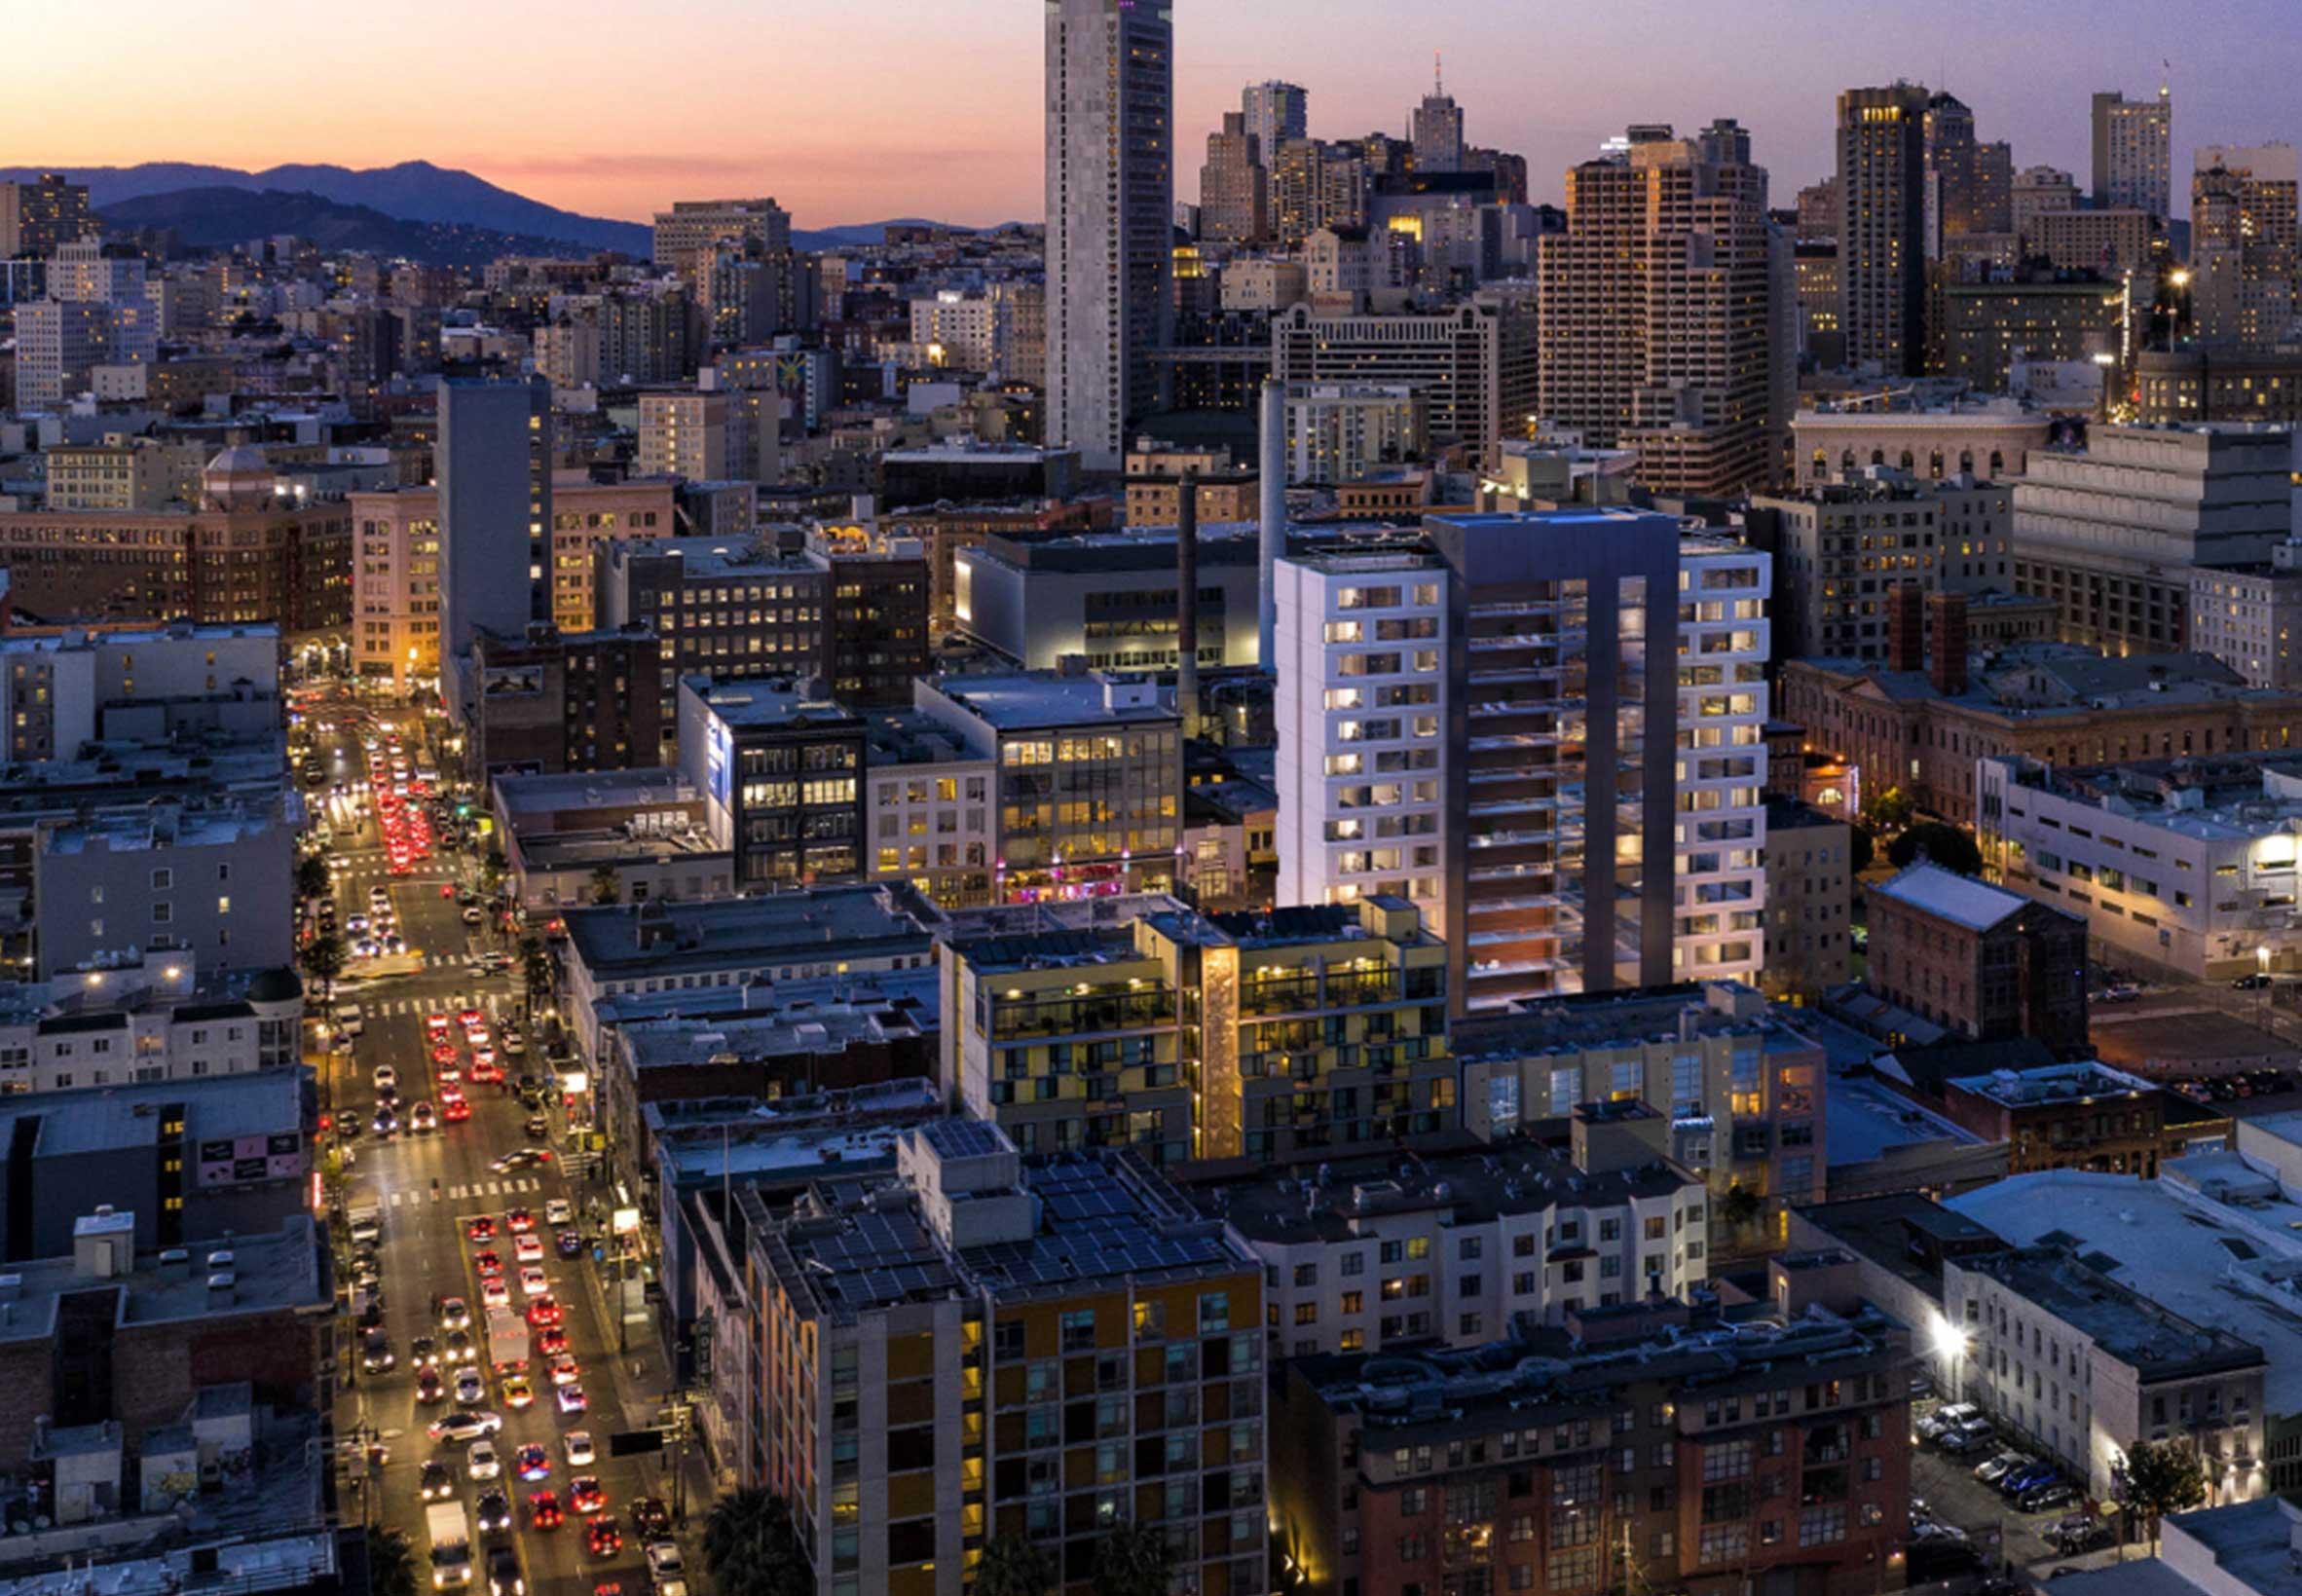 Star City Minna San Francisco Holmes